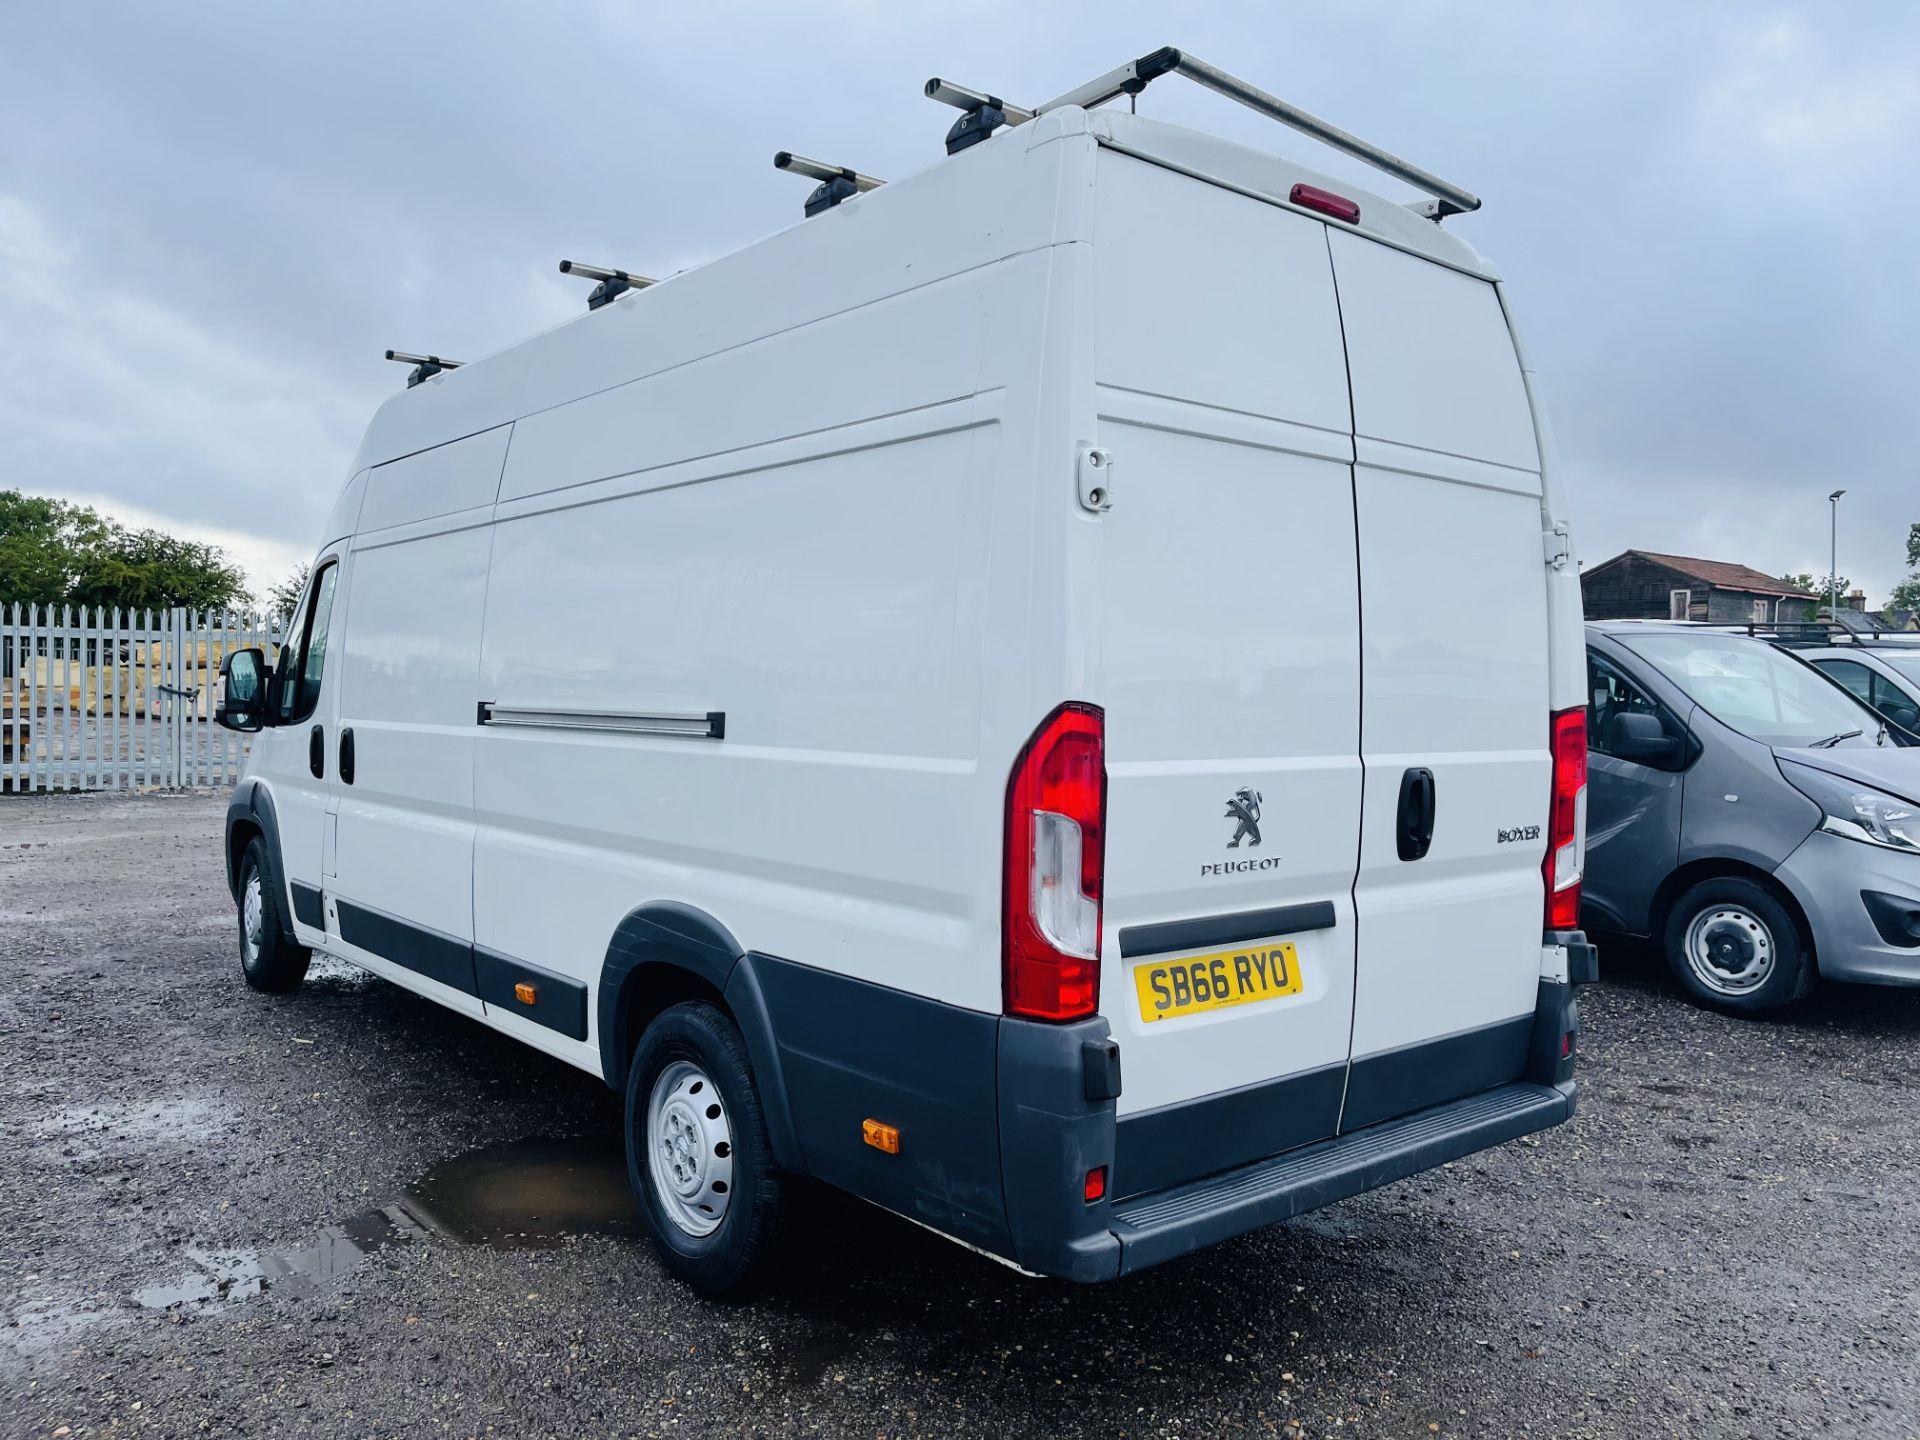 ** ON SALE ** Peugeot Boxer 2.0 BlueHDI L4 H3 2017 '66 Reg' Panel Van - LCV - Euro 6b ULEZ Compliant - Image 10 of 18